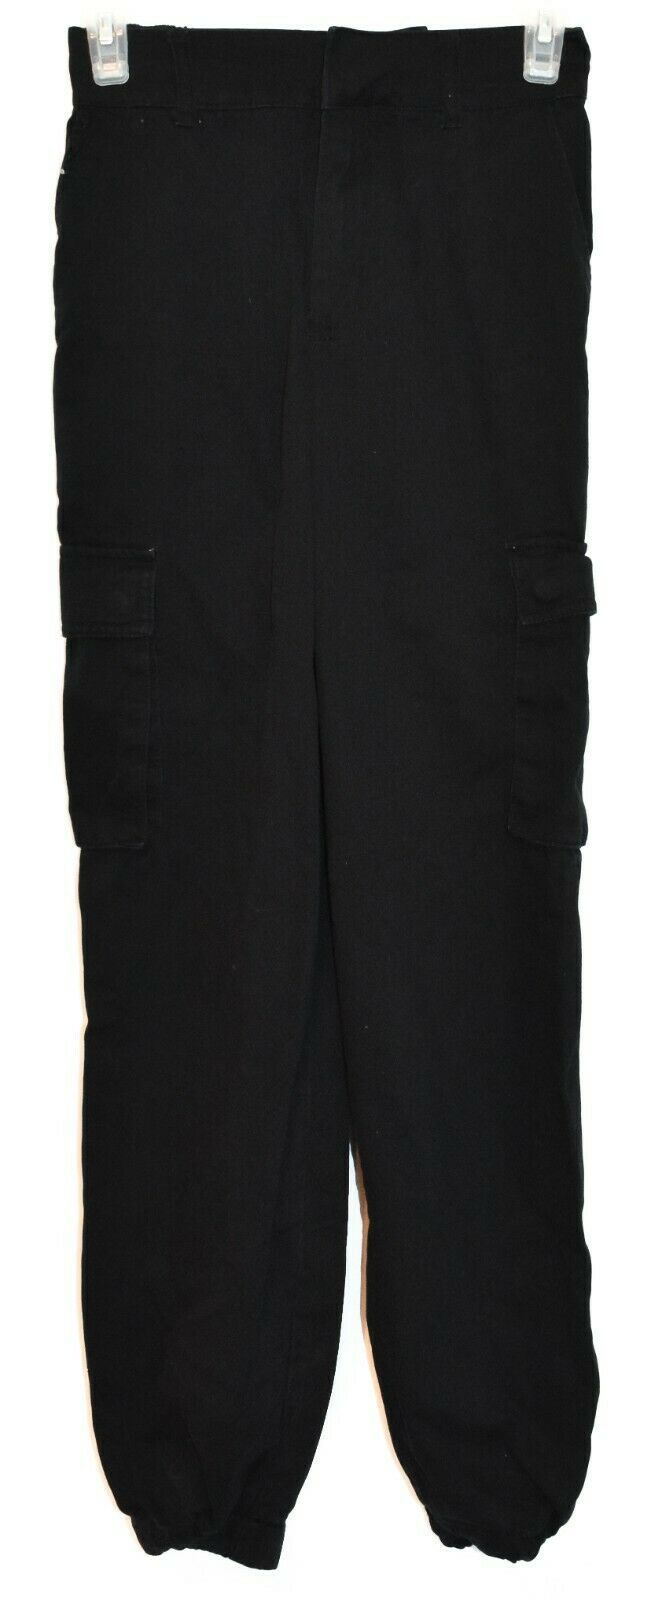 Forever 21 Women's Black Utility Cargo Cotton Jogger Pants Size XS